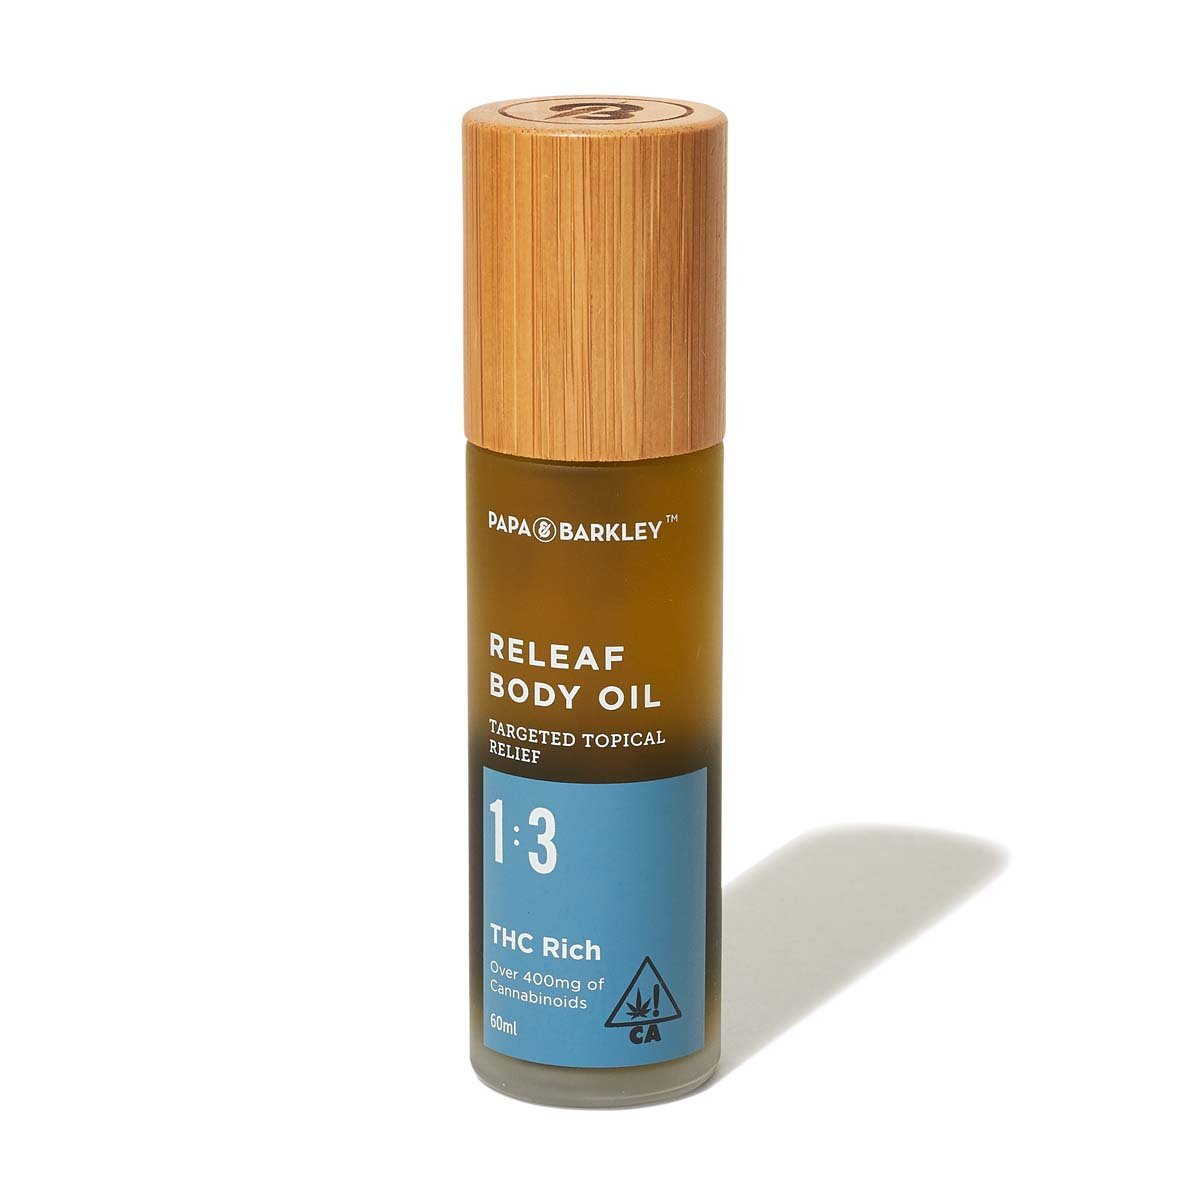 Releaf Body Oil